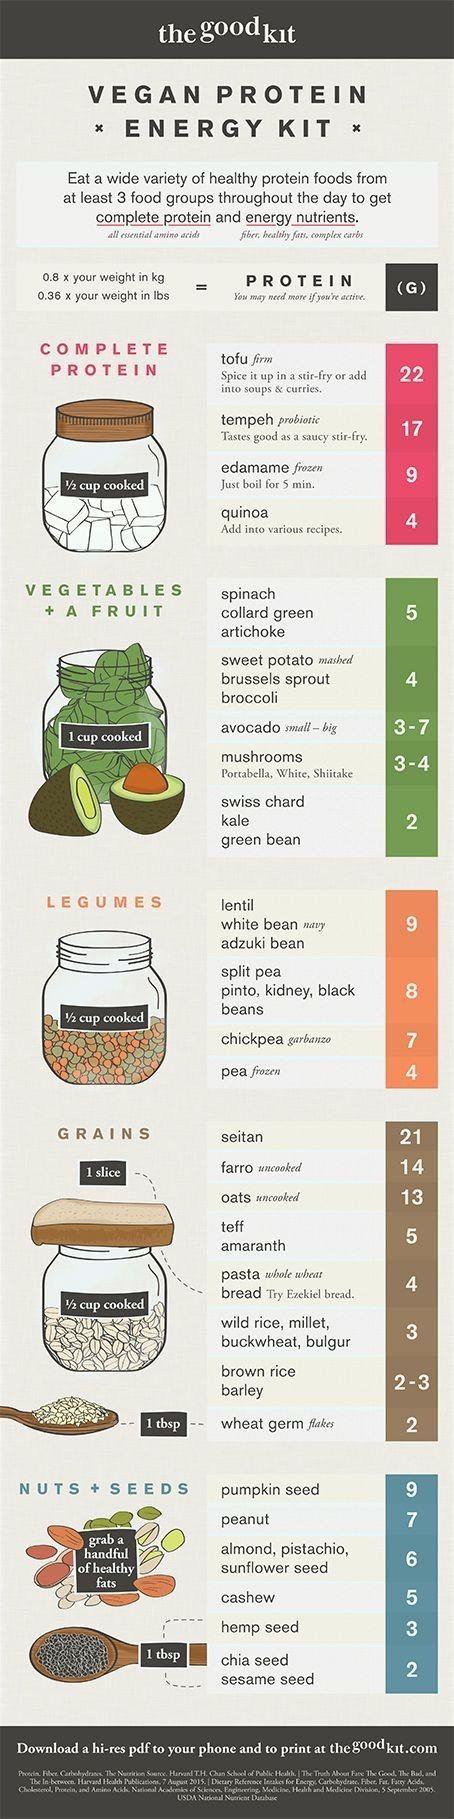 Vegan Protein Energy Kit #3WEEKDIET